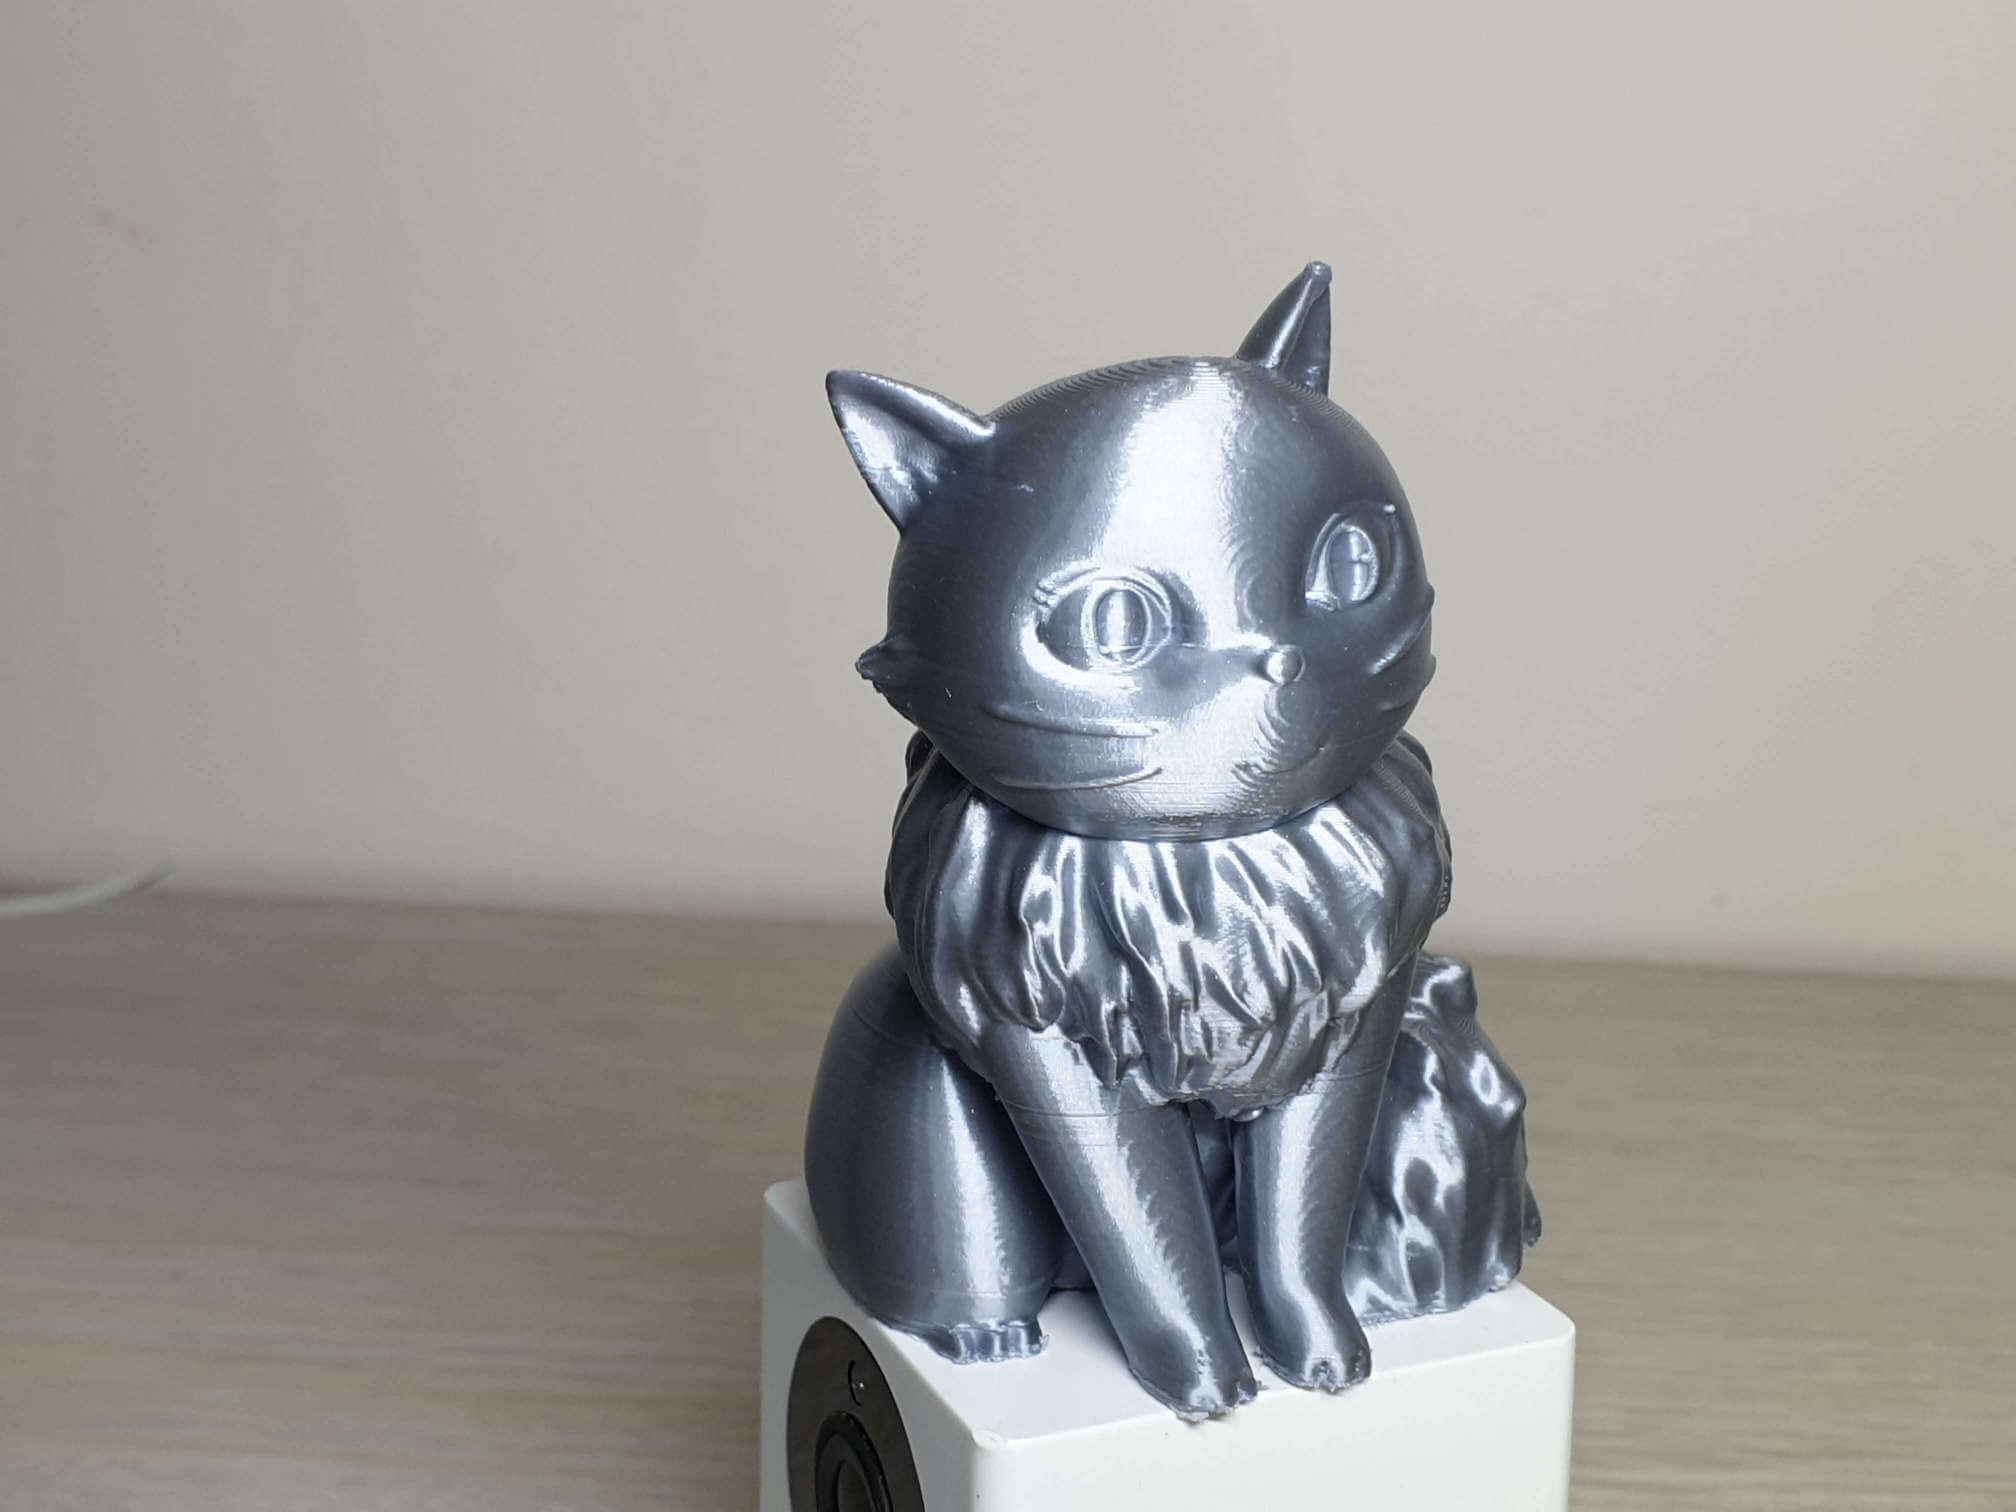 Lily printed on Longer Cube2 Mini 4 | Cube2 Mini Review - 3D Printer for Kids